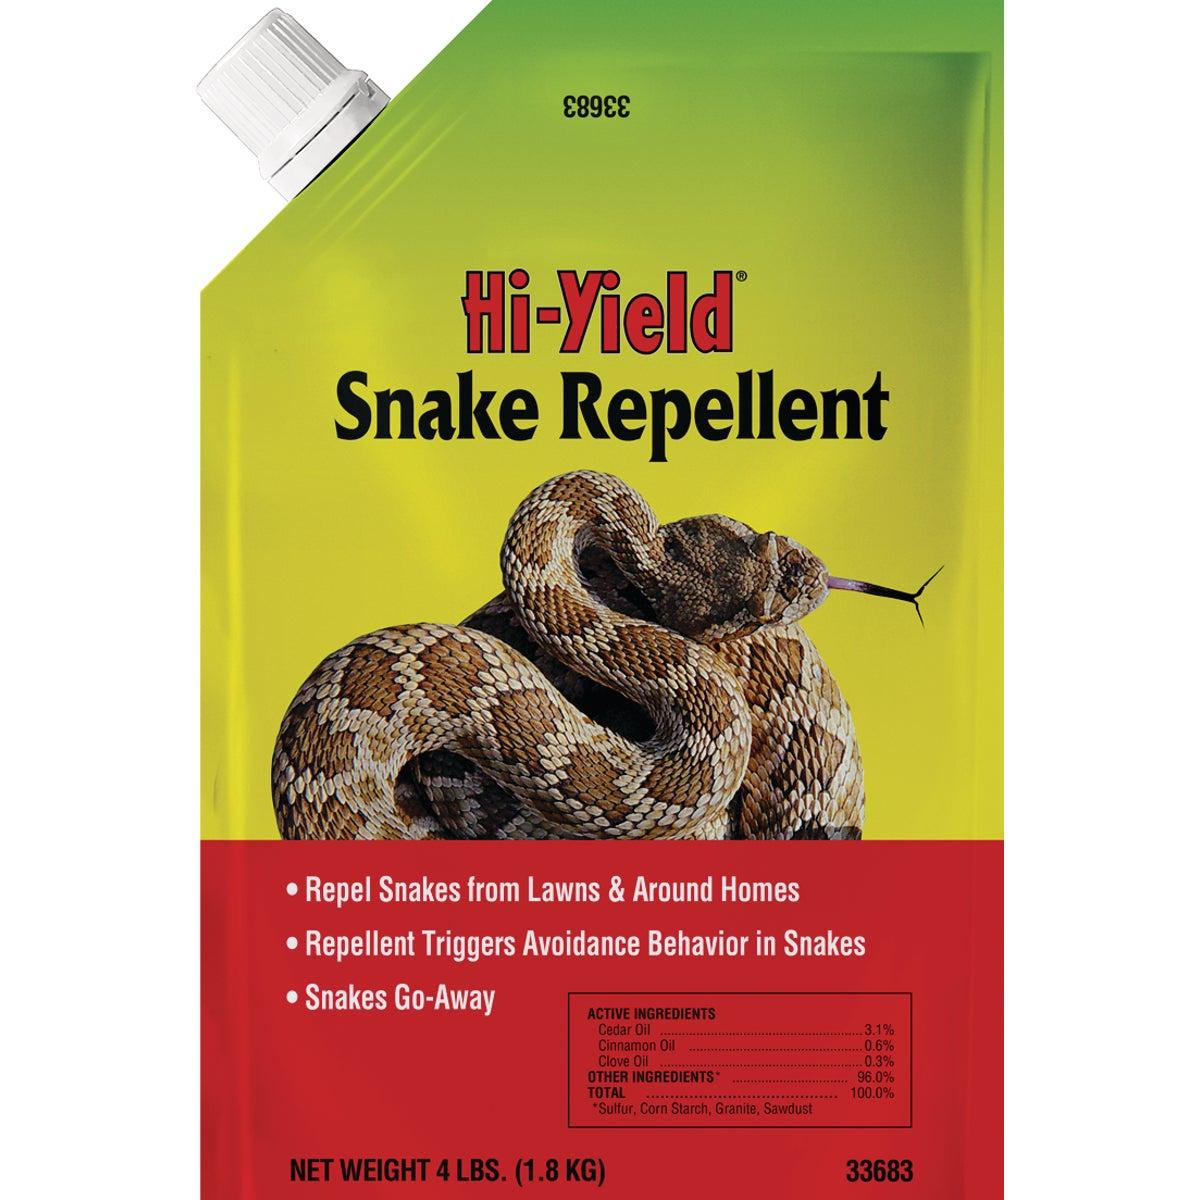 4Lb Snake Repellent